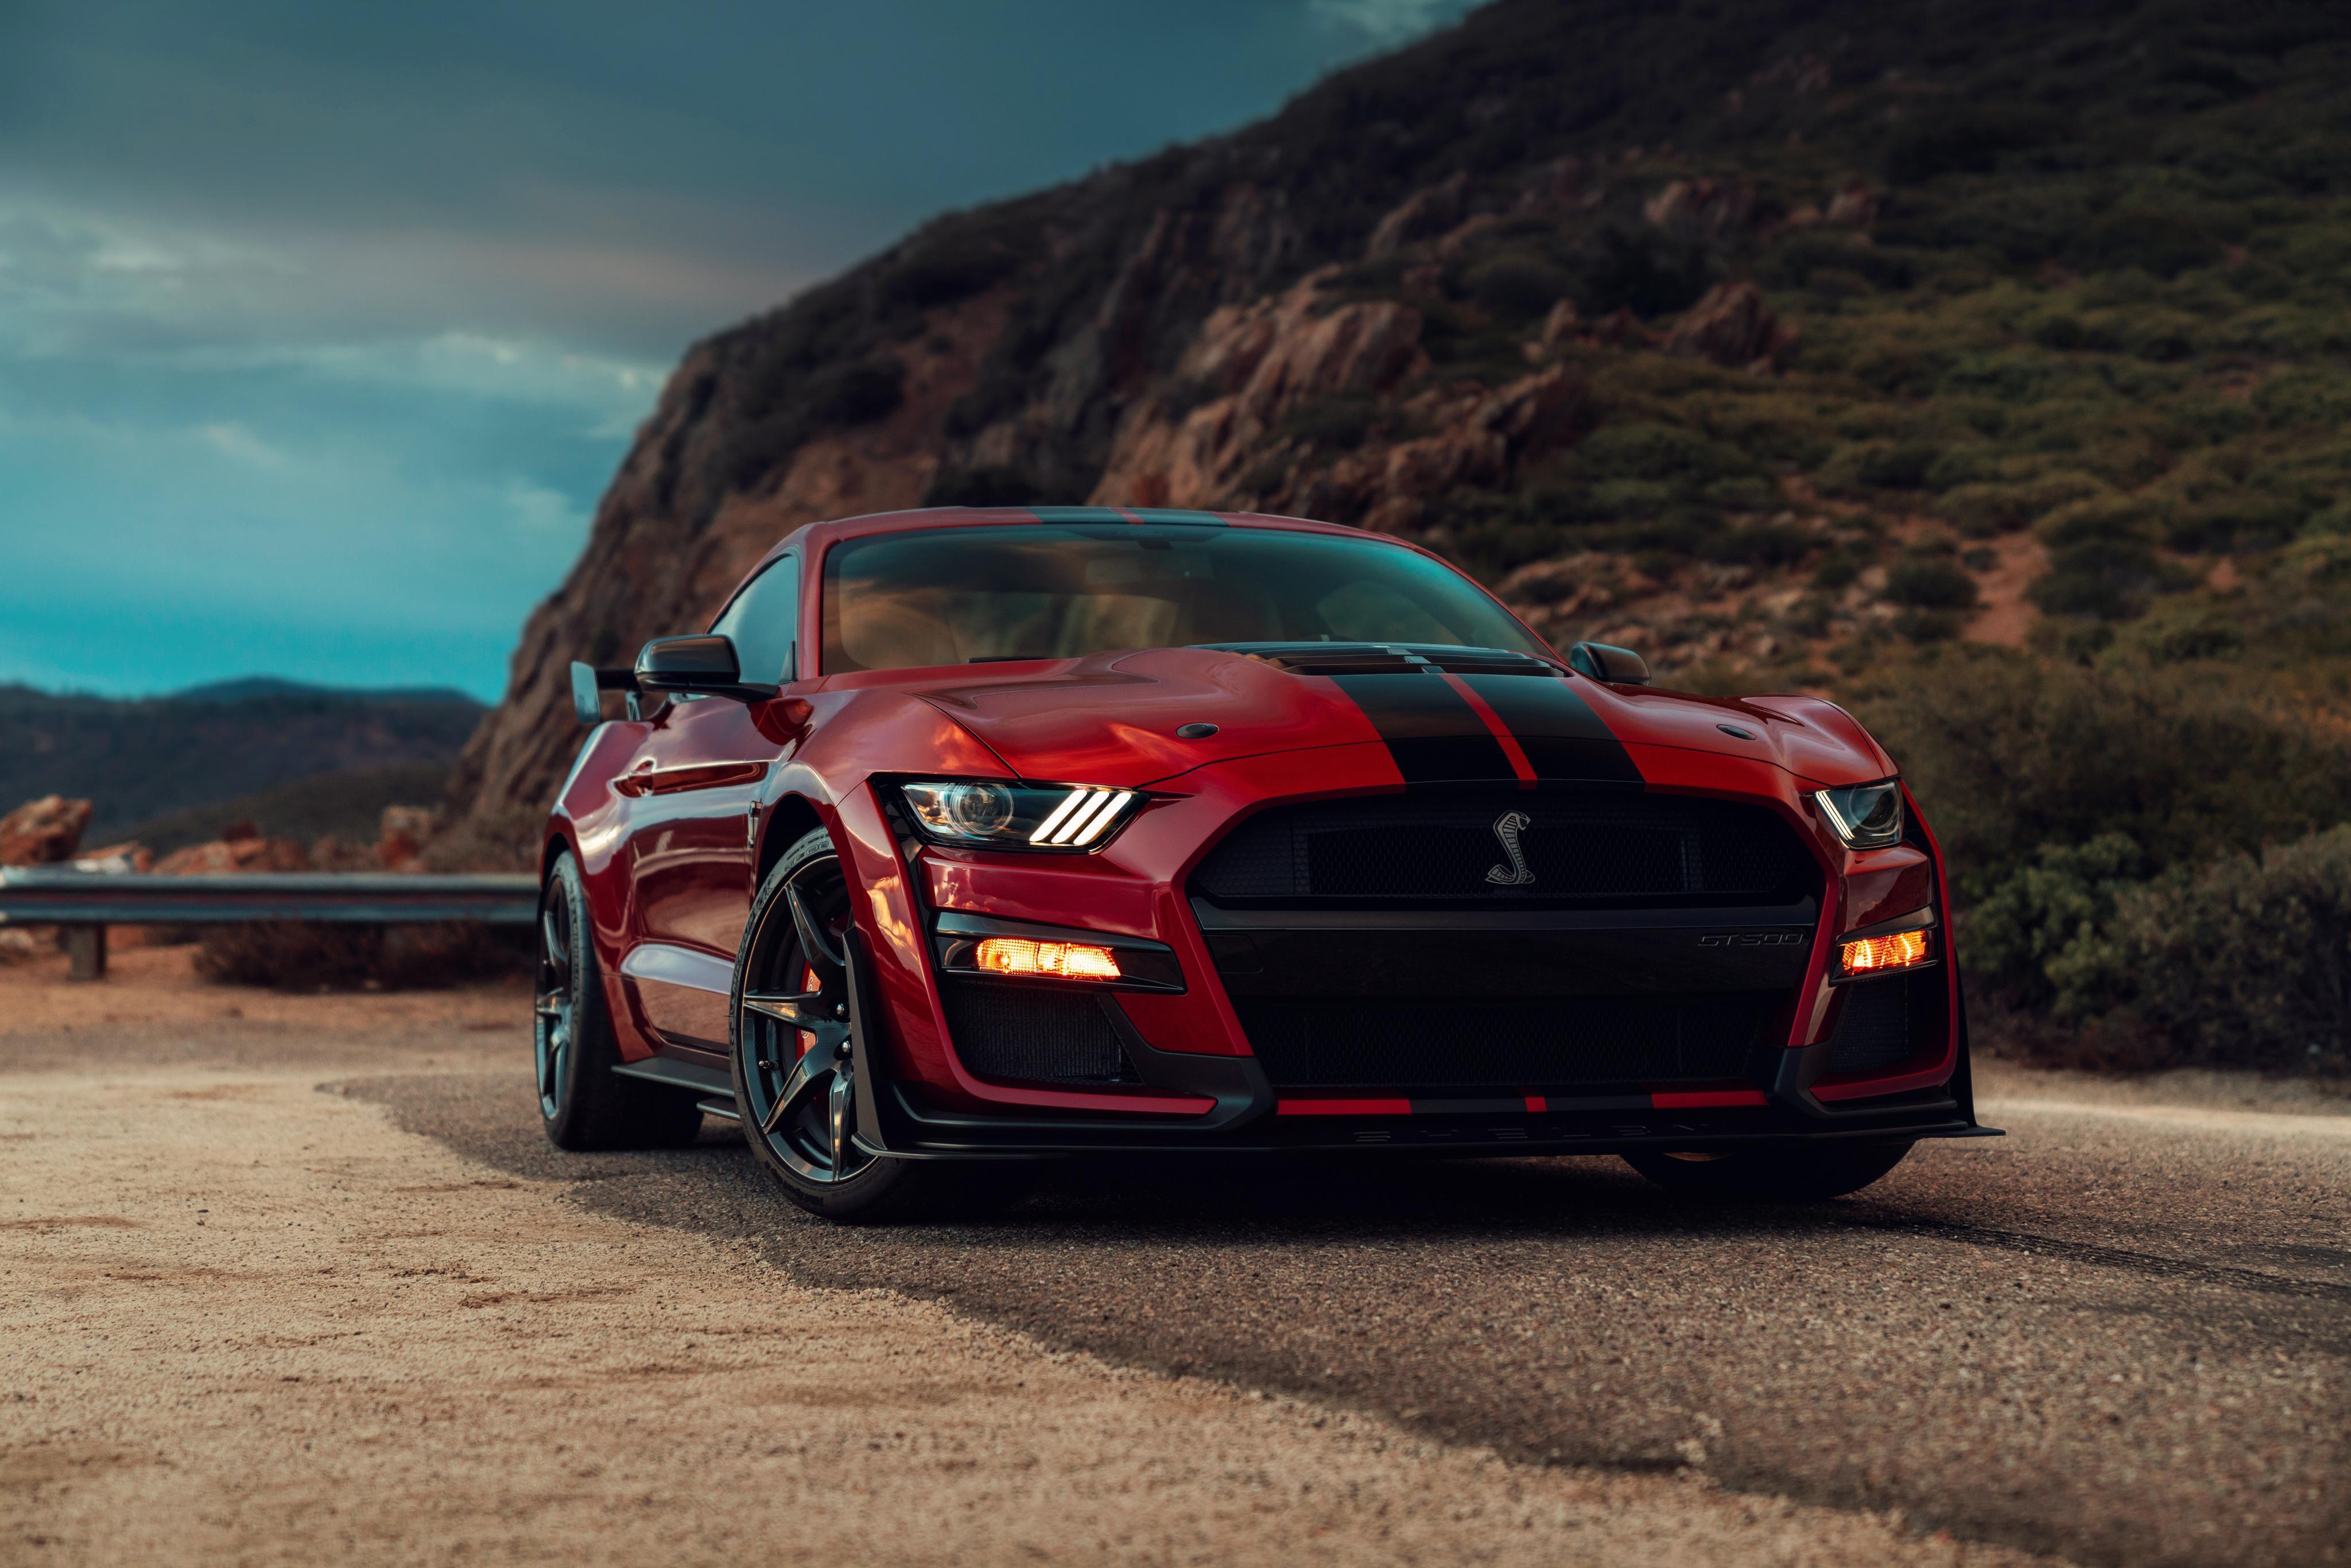 Mustang 2020 Wallpapers Wallpaper Cave